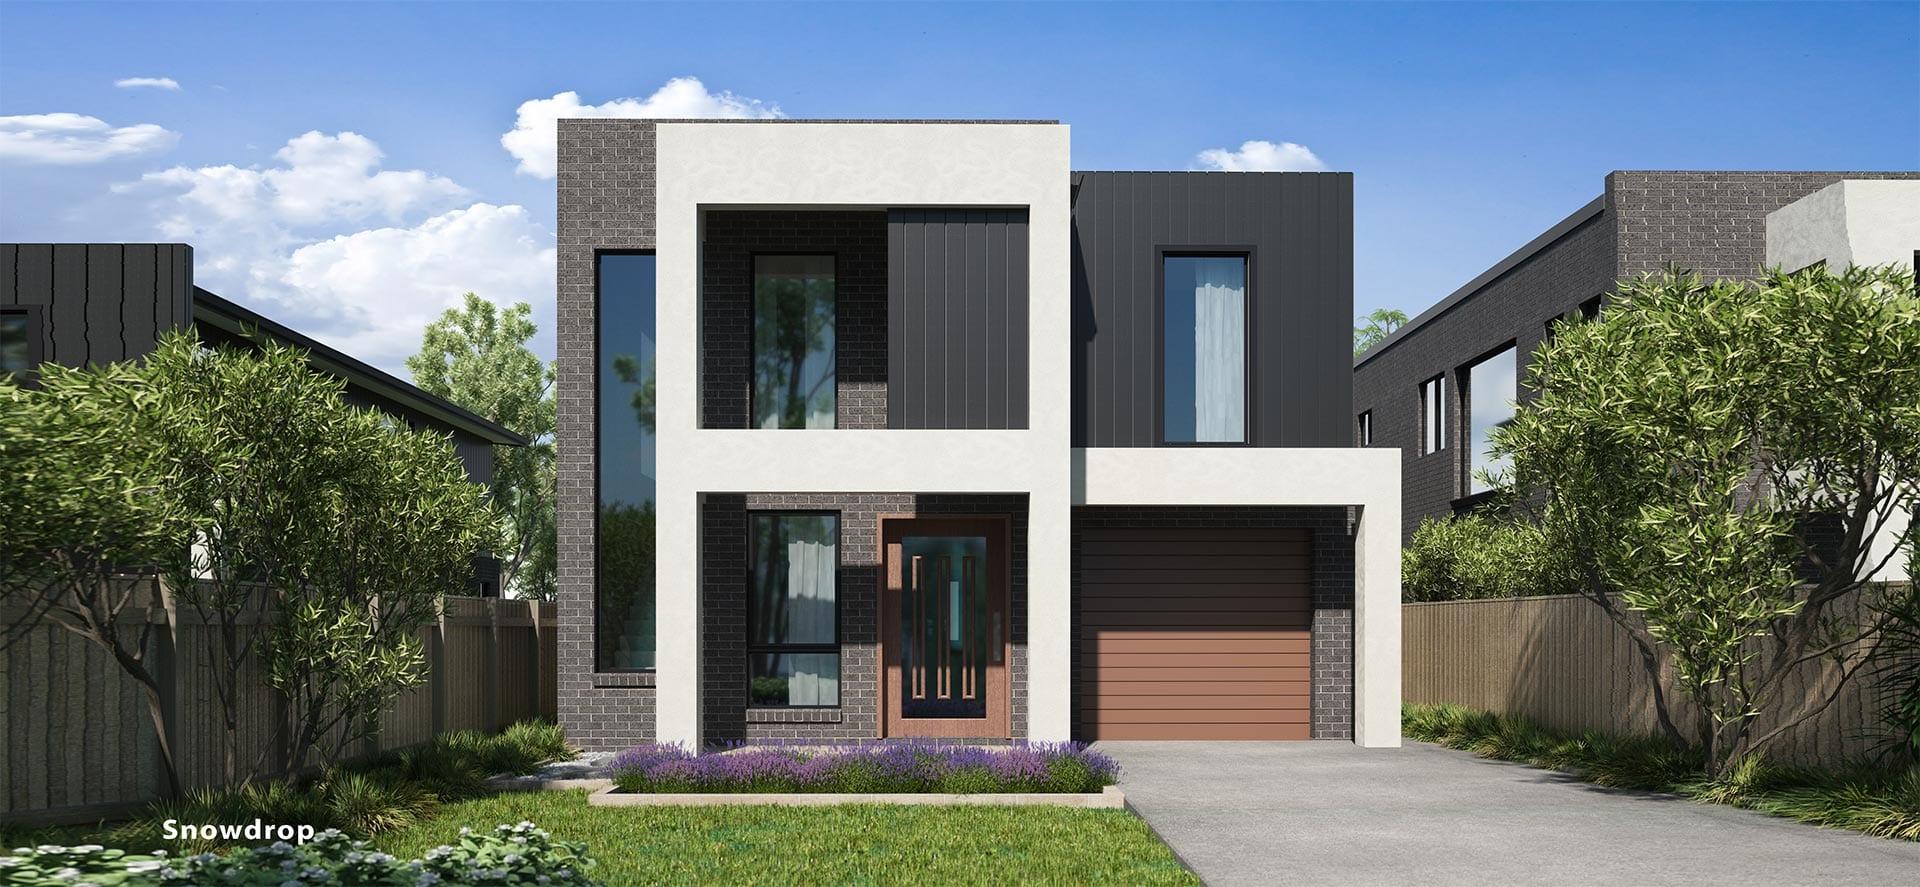 Snowdrop Double House Design